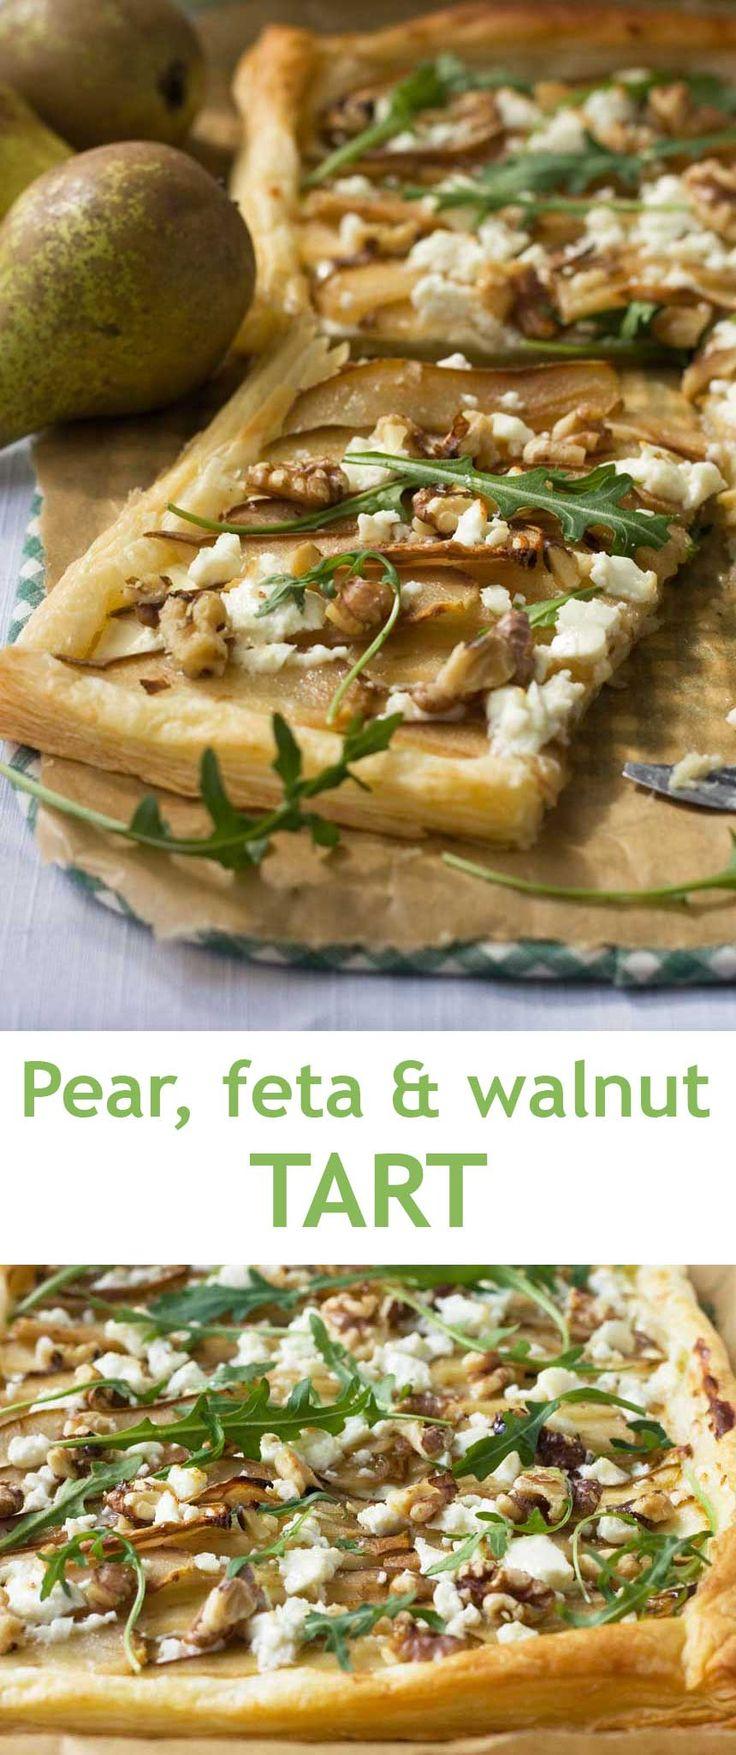 Pear, feta and walnut tart                                                                                                                                                                                 More